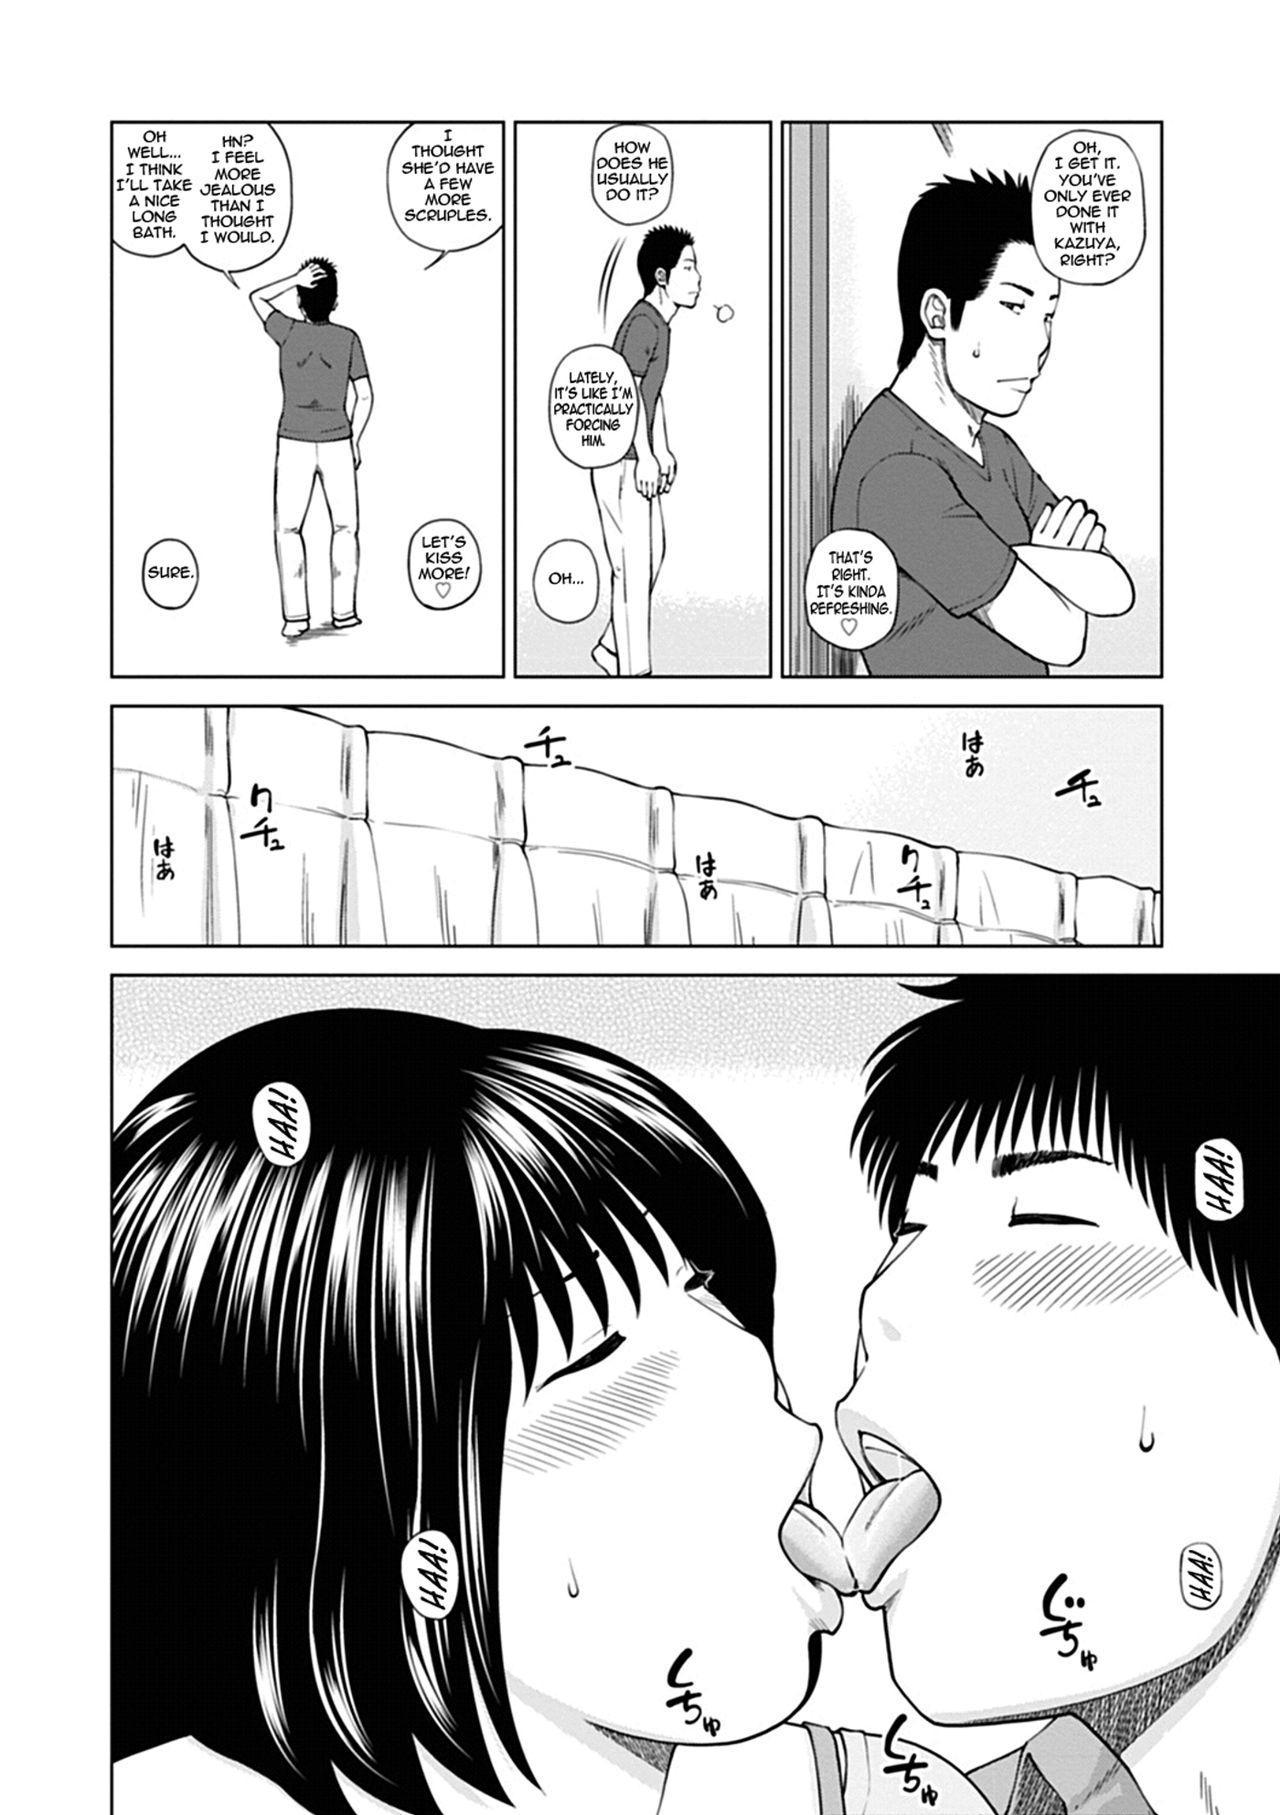 [Kuroki Hidehiko] 36-sai Injuku Sakarizuma | 36-Year-Old Randy Mature Wife [English] {Tadanohito} [Digital] [Uncensored] 103